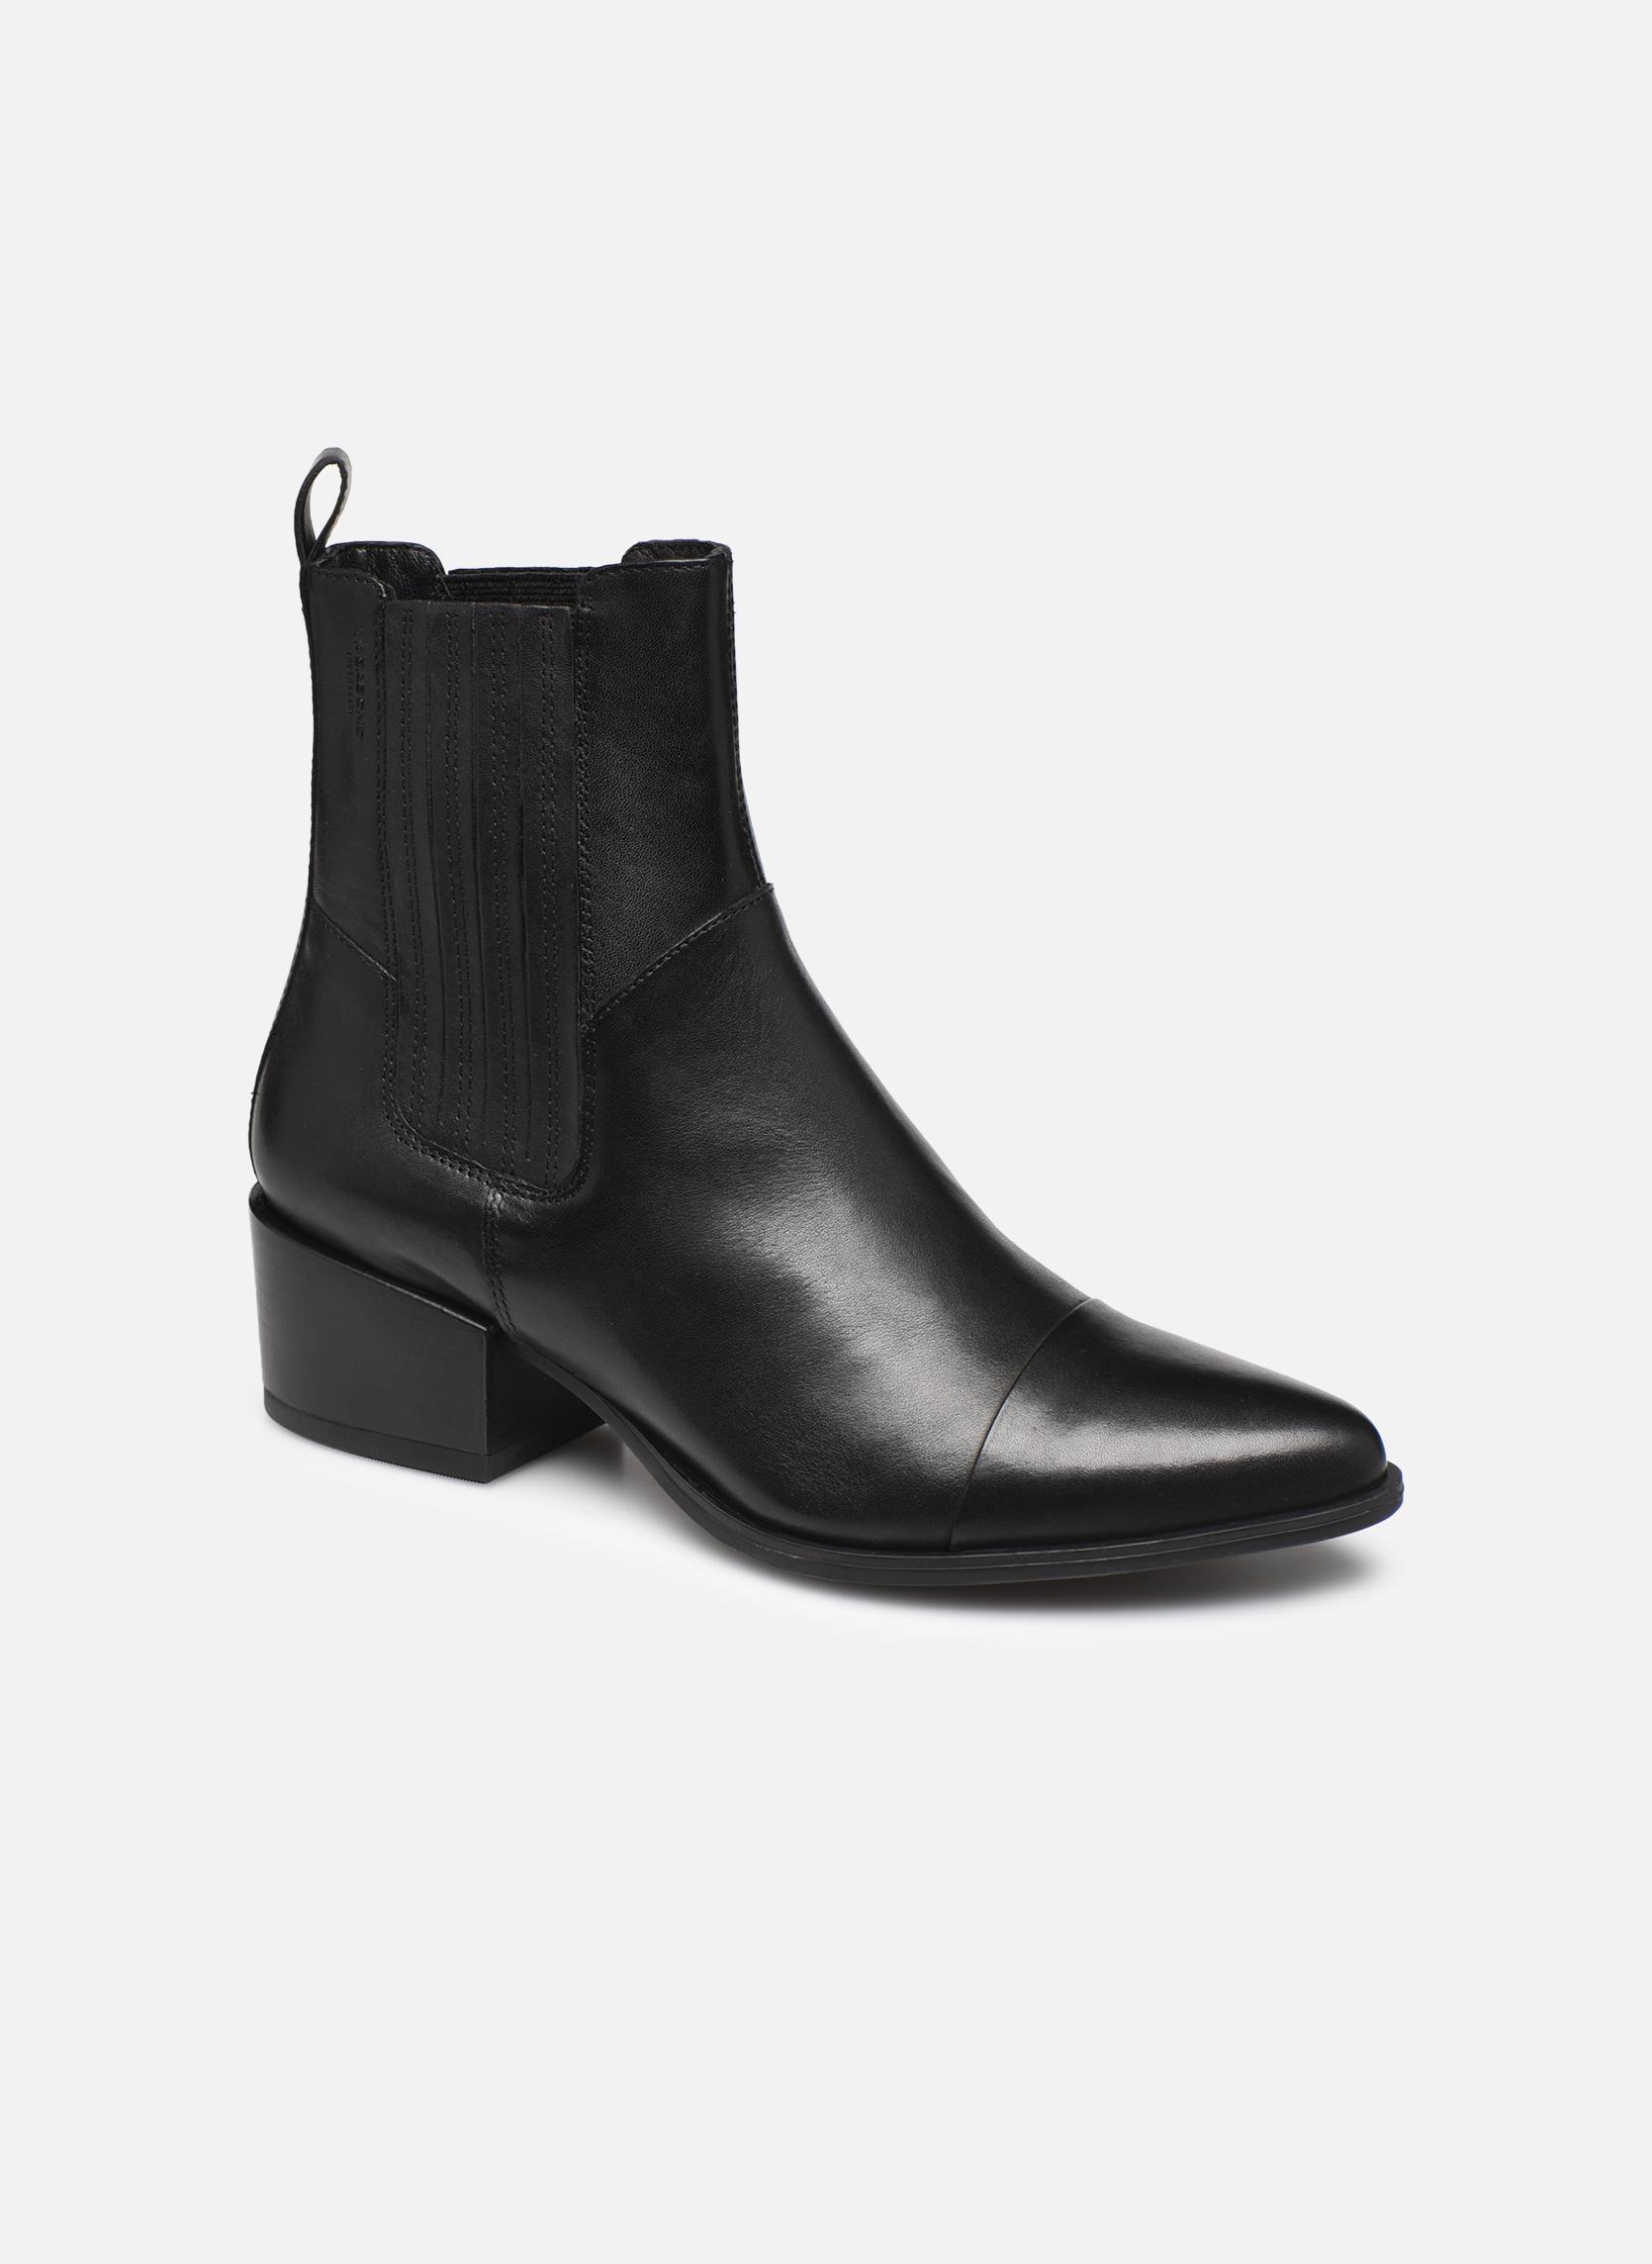 Boots en enkellaarsjes Dames Marja 4013-401